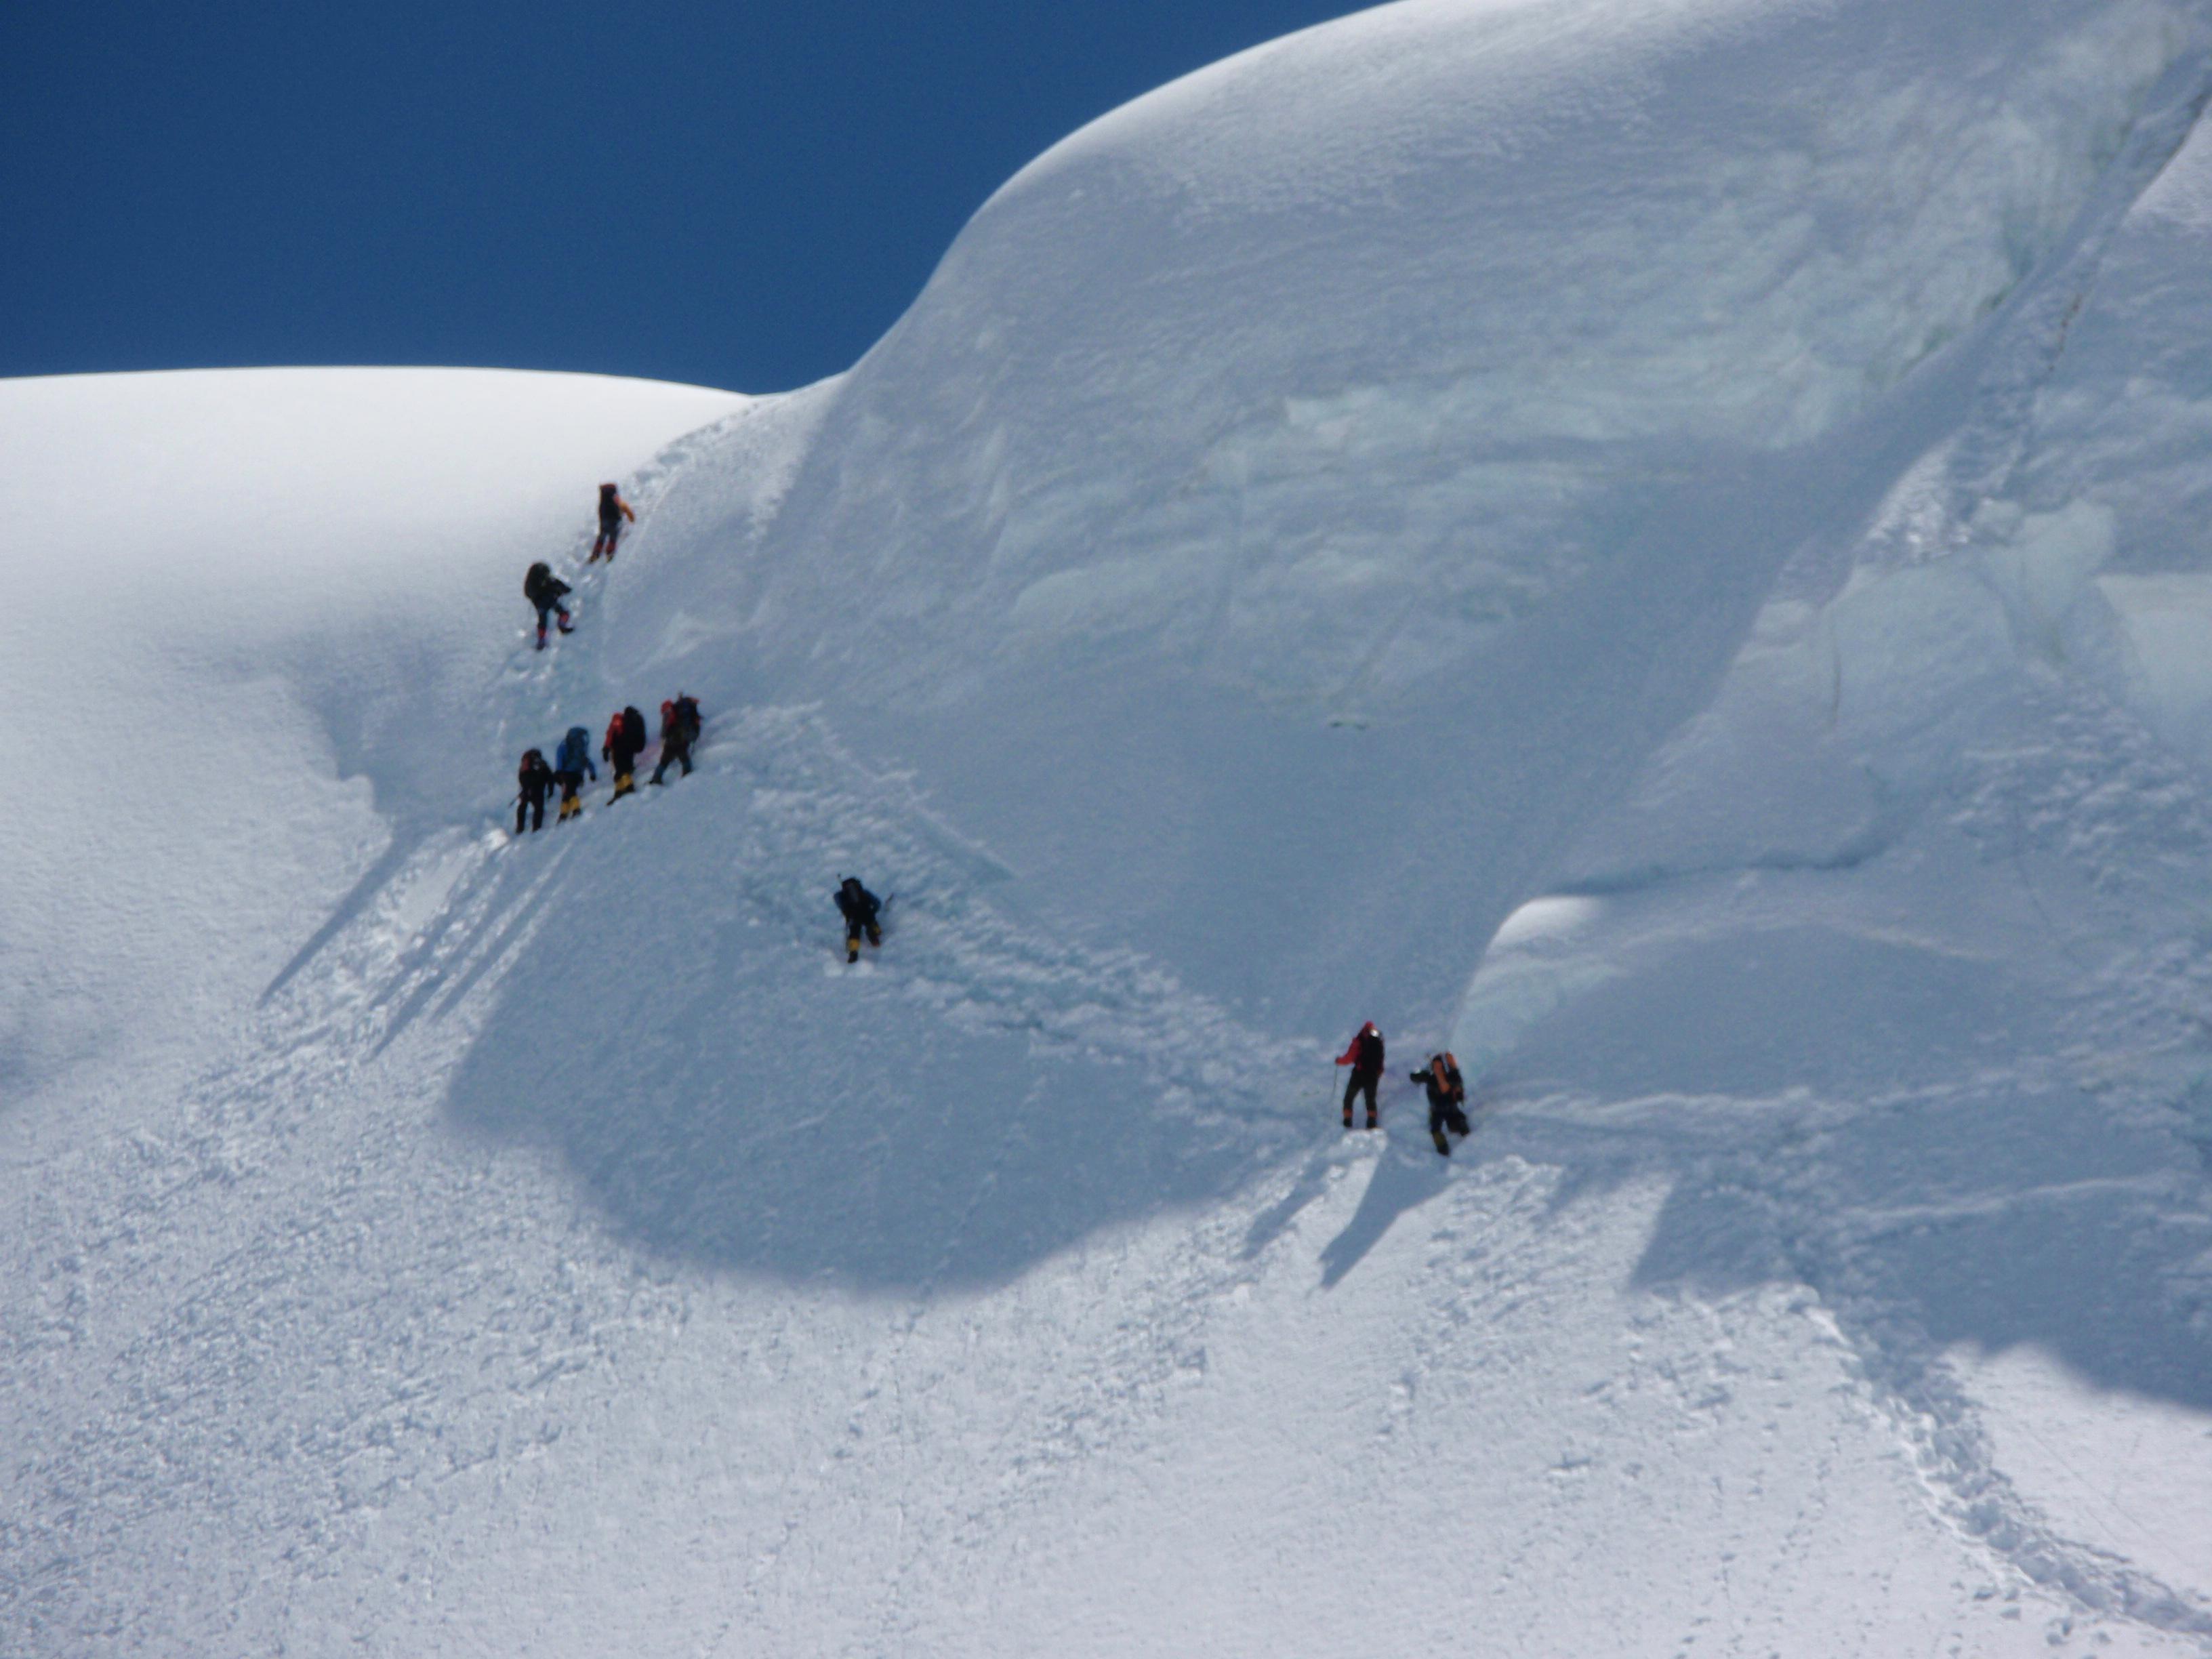 Climbing to Camp 2 through the ice cliff (Greg Vernovage)